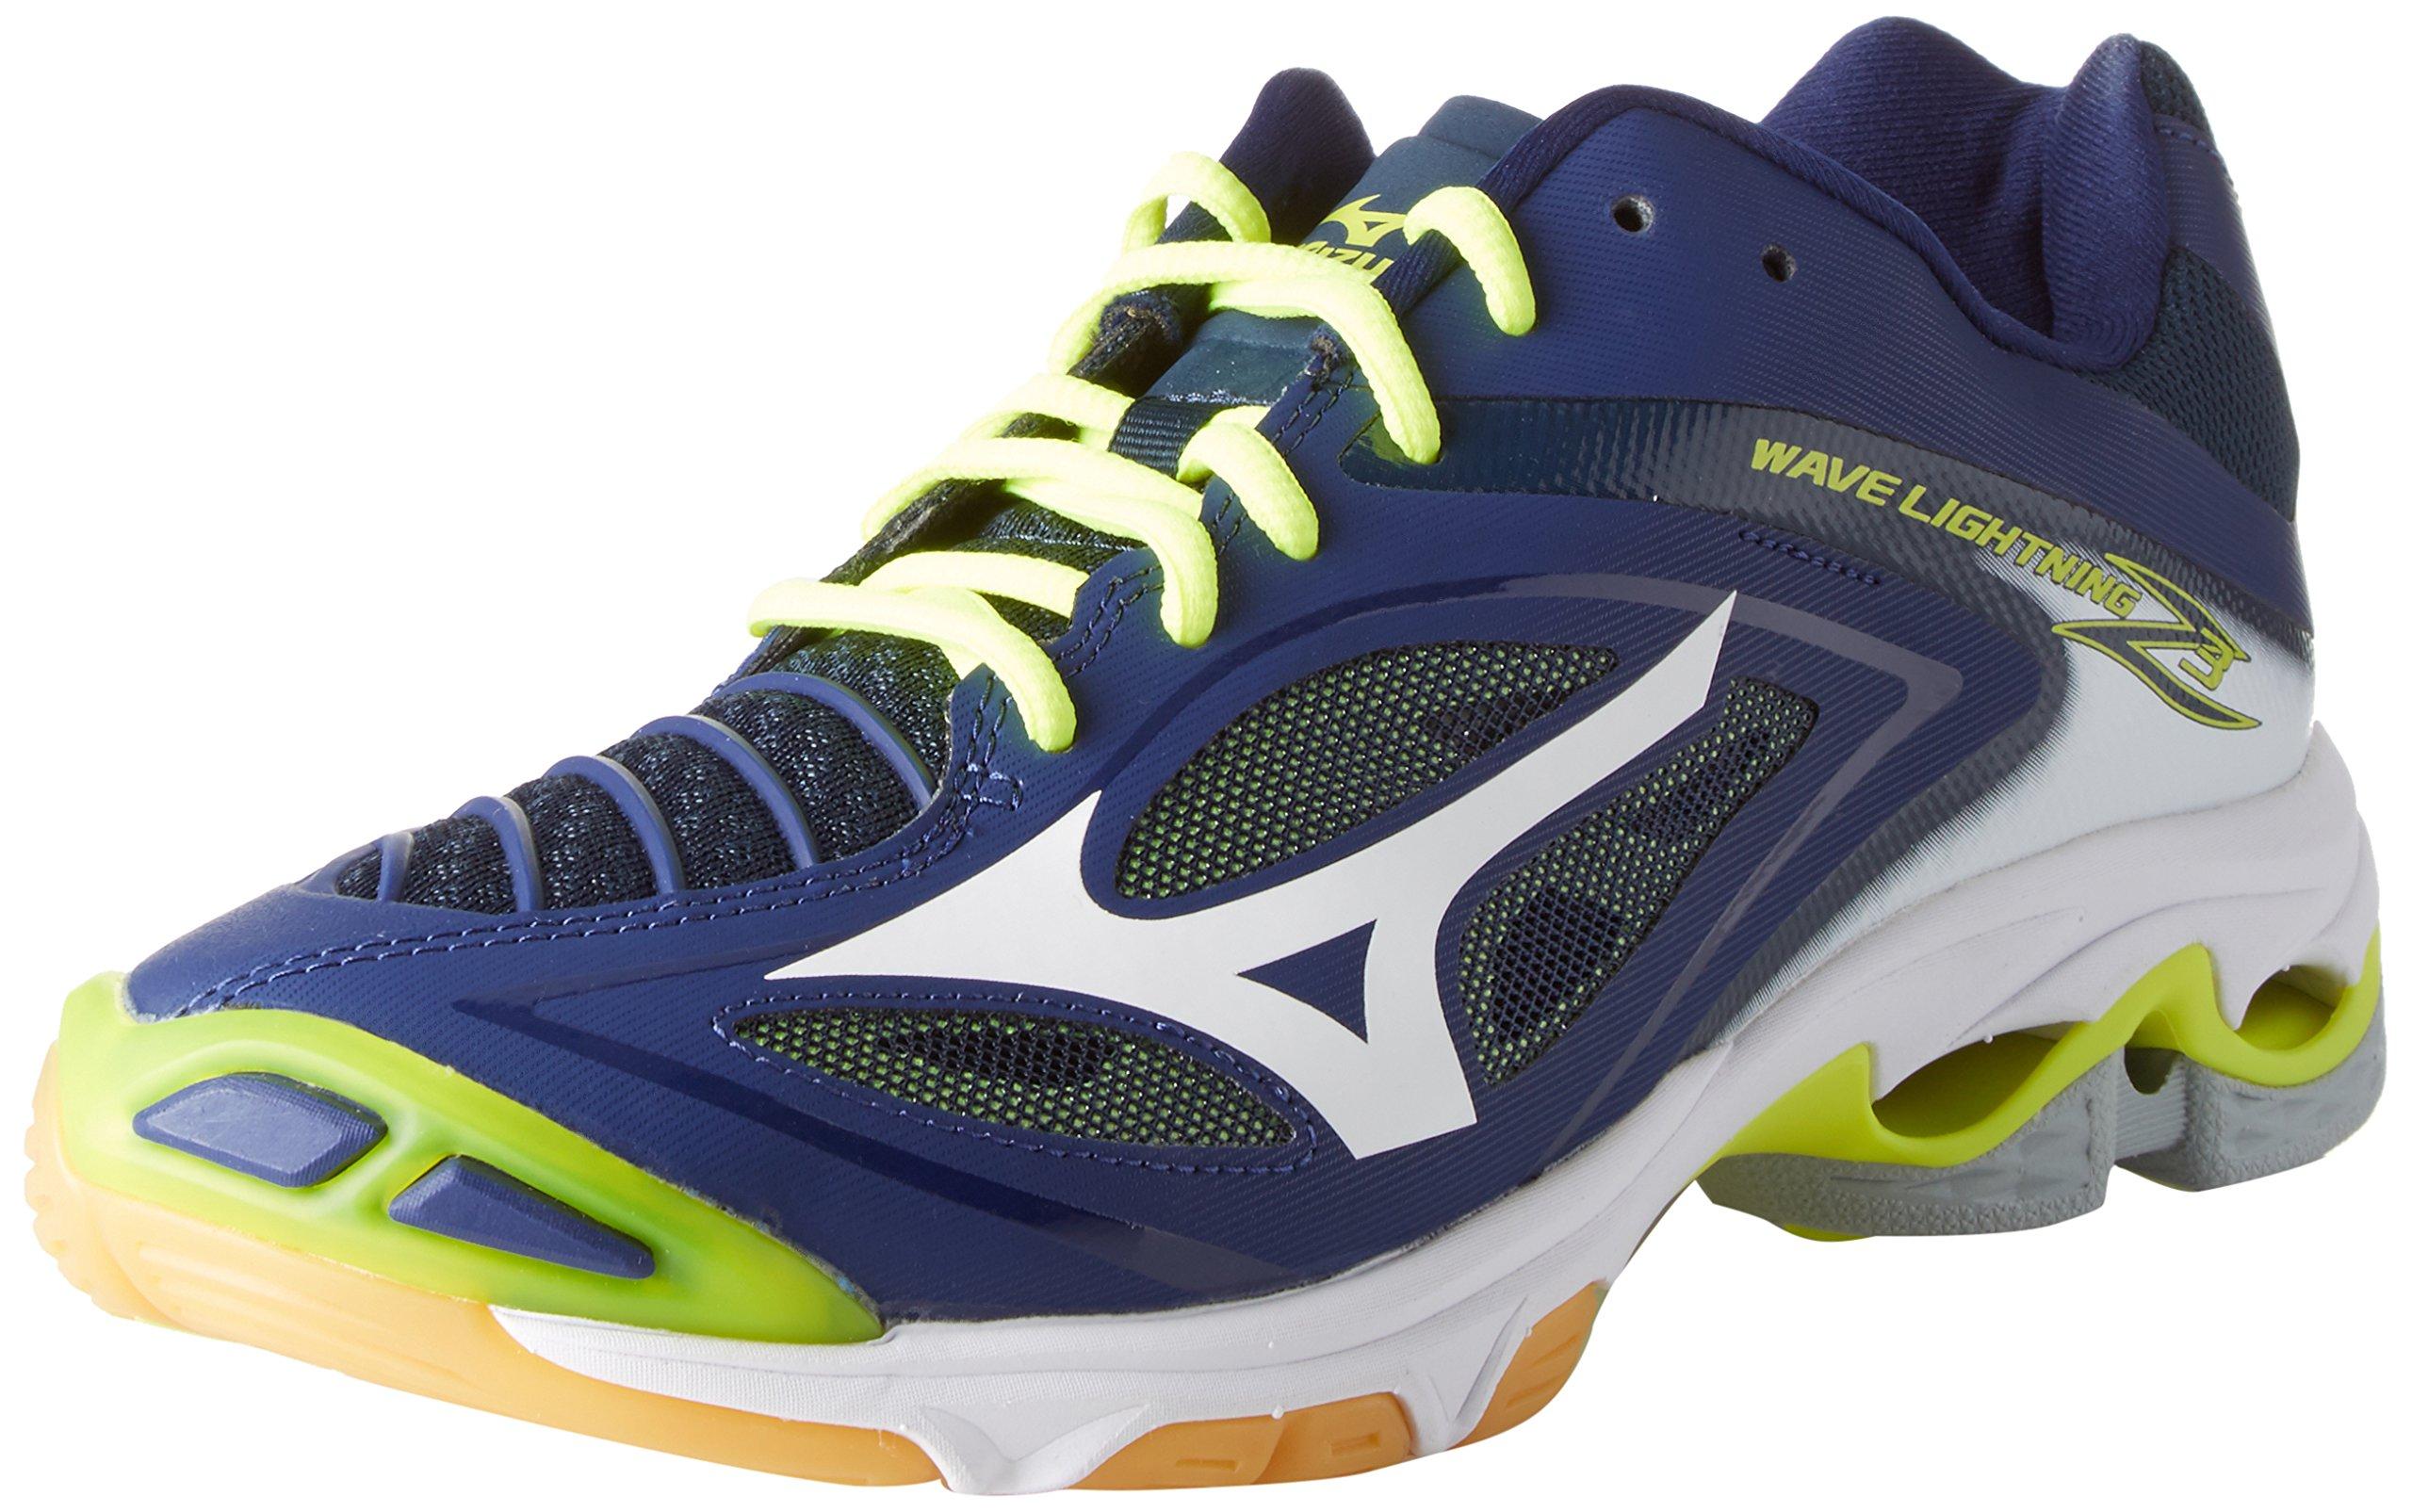 buy mizuno volleyball shoes uk buy online